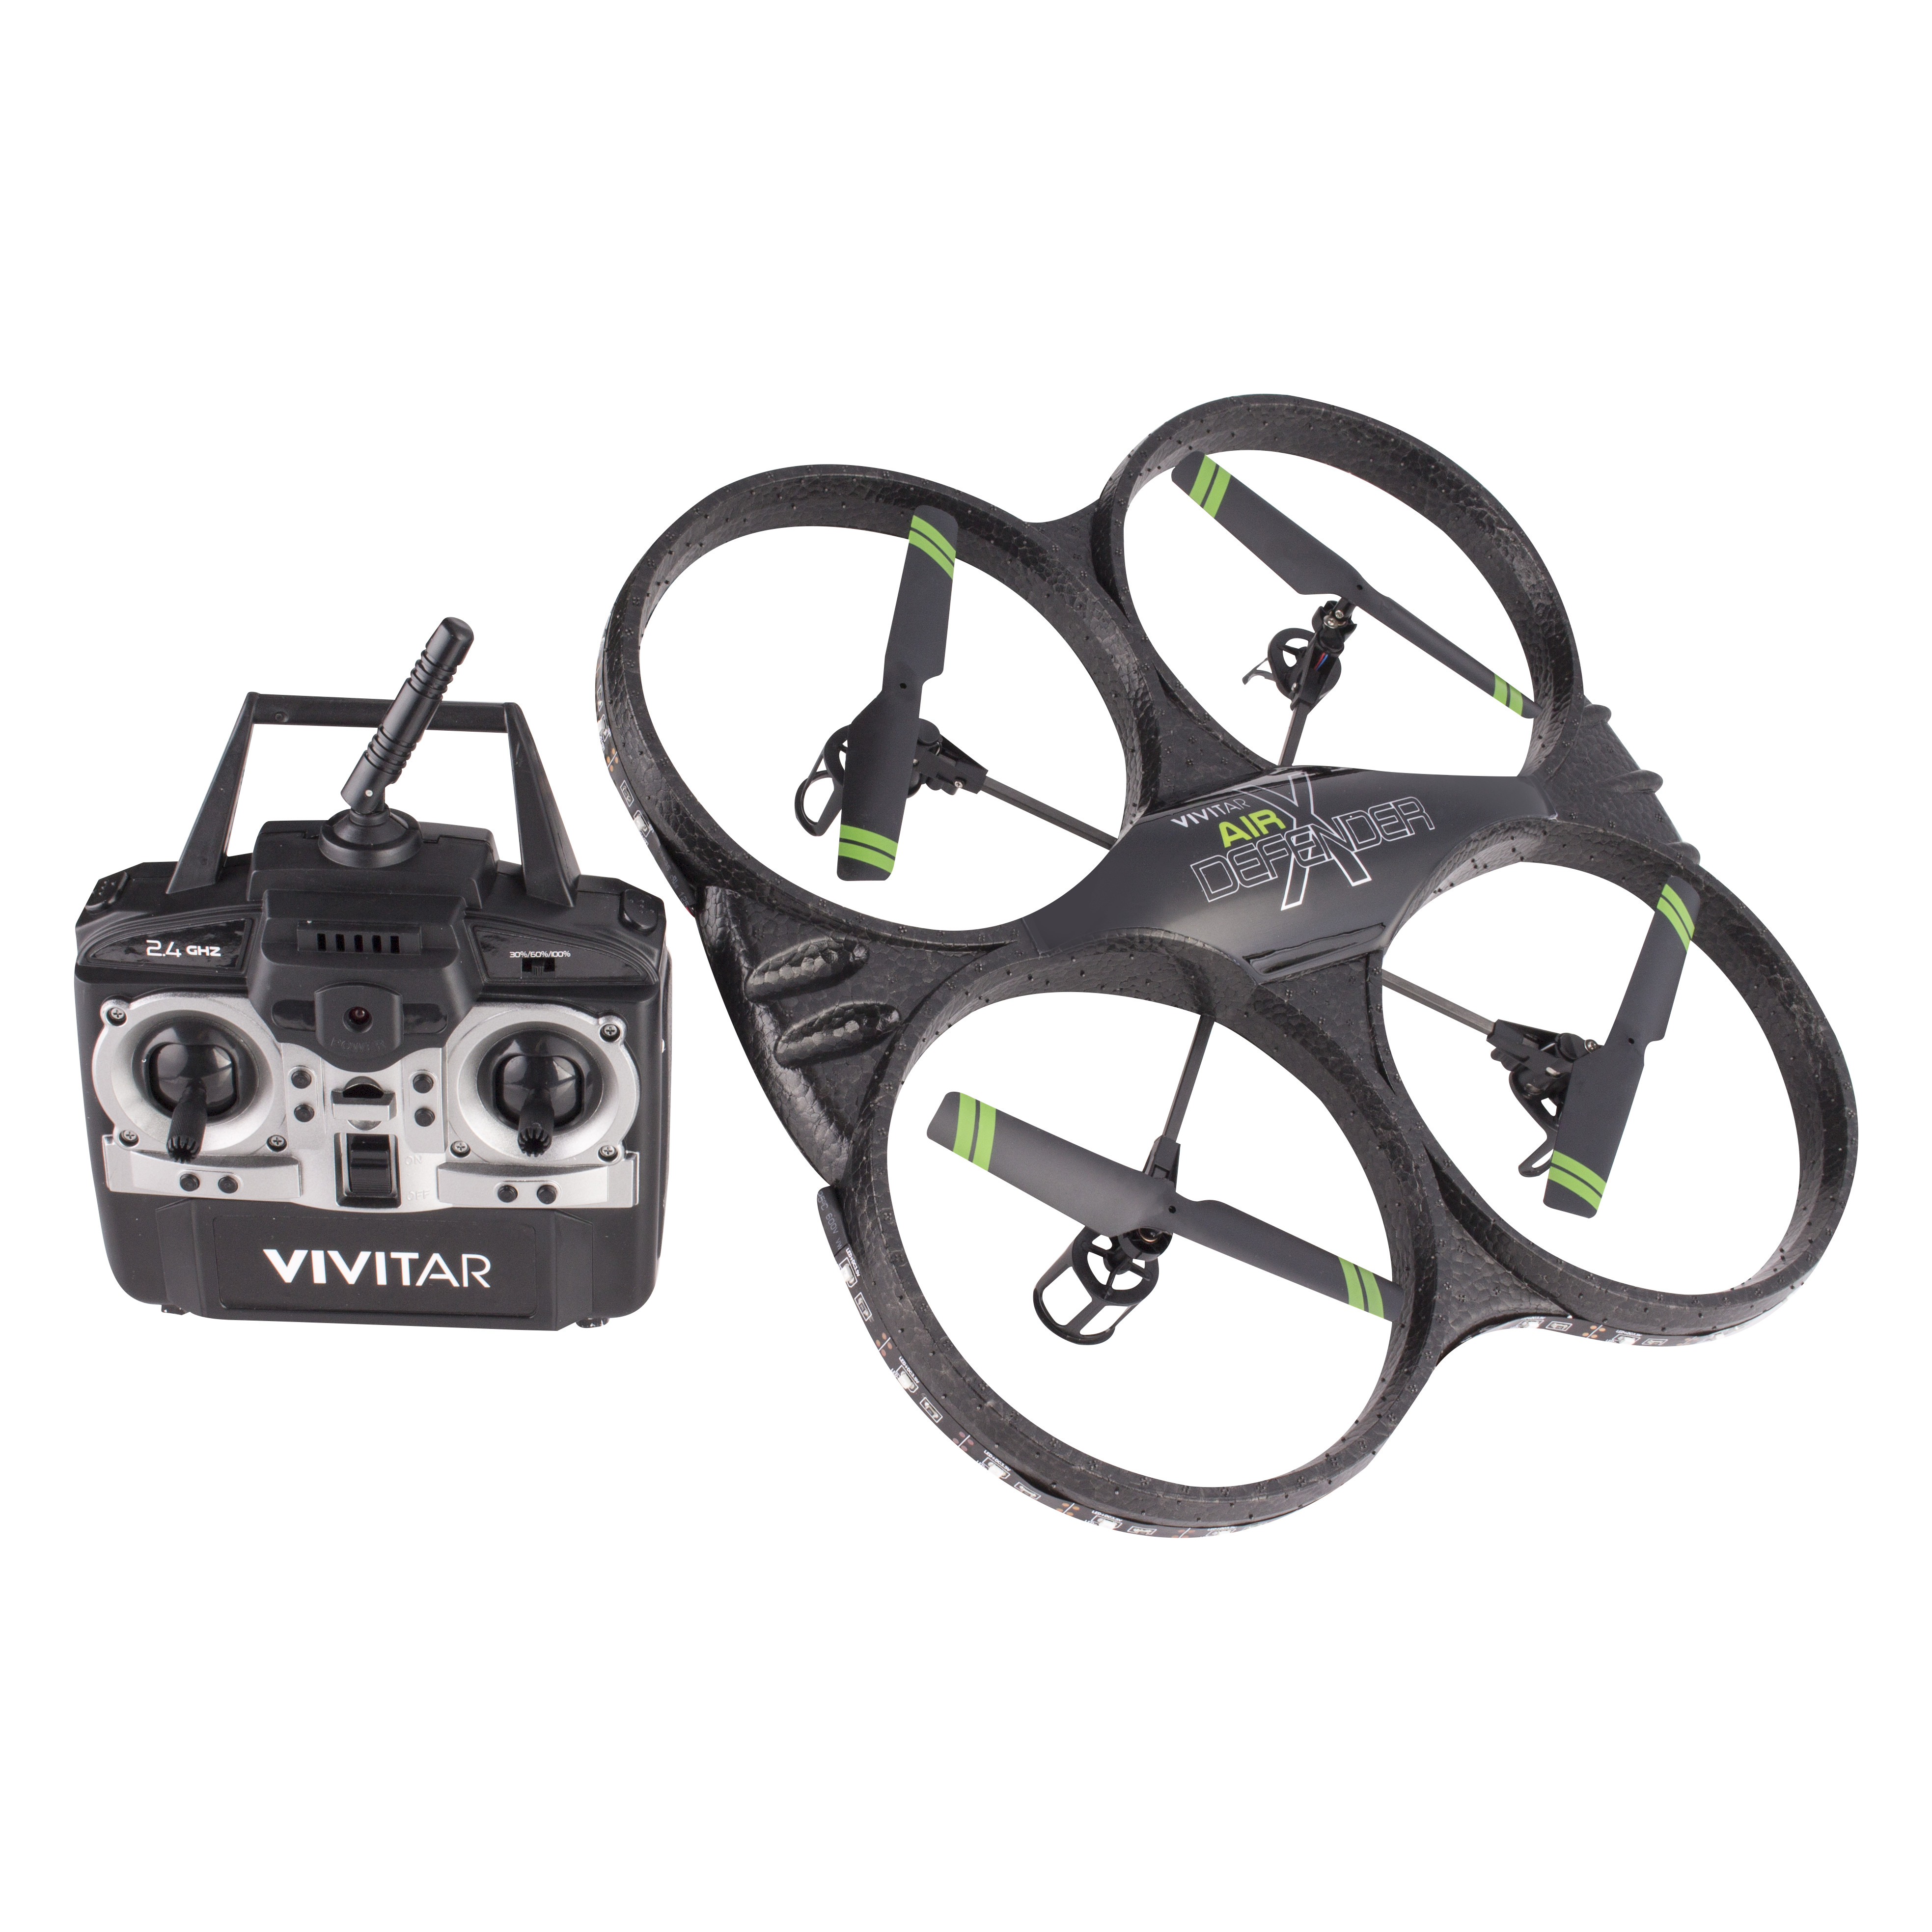 Vivitar Air Defender Drone